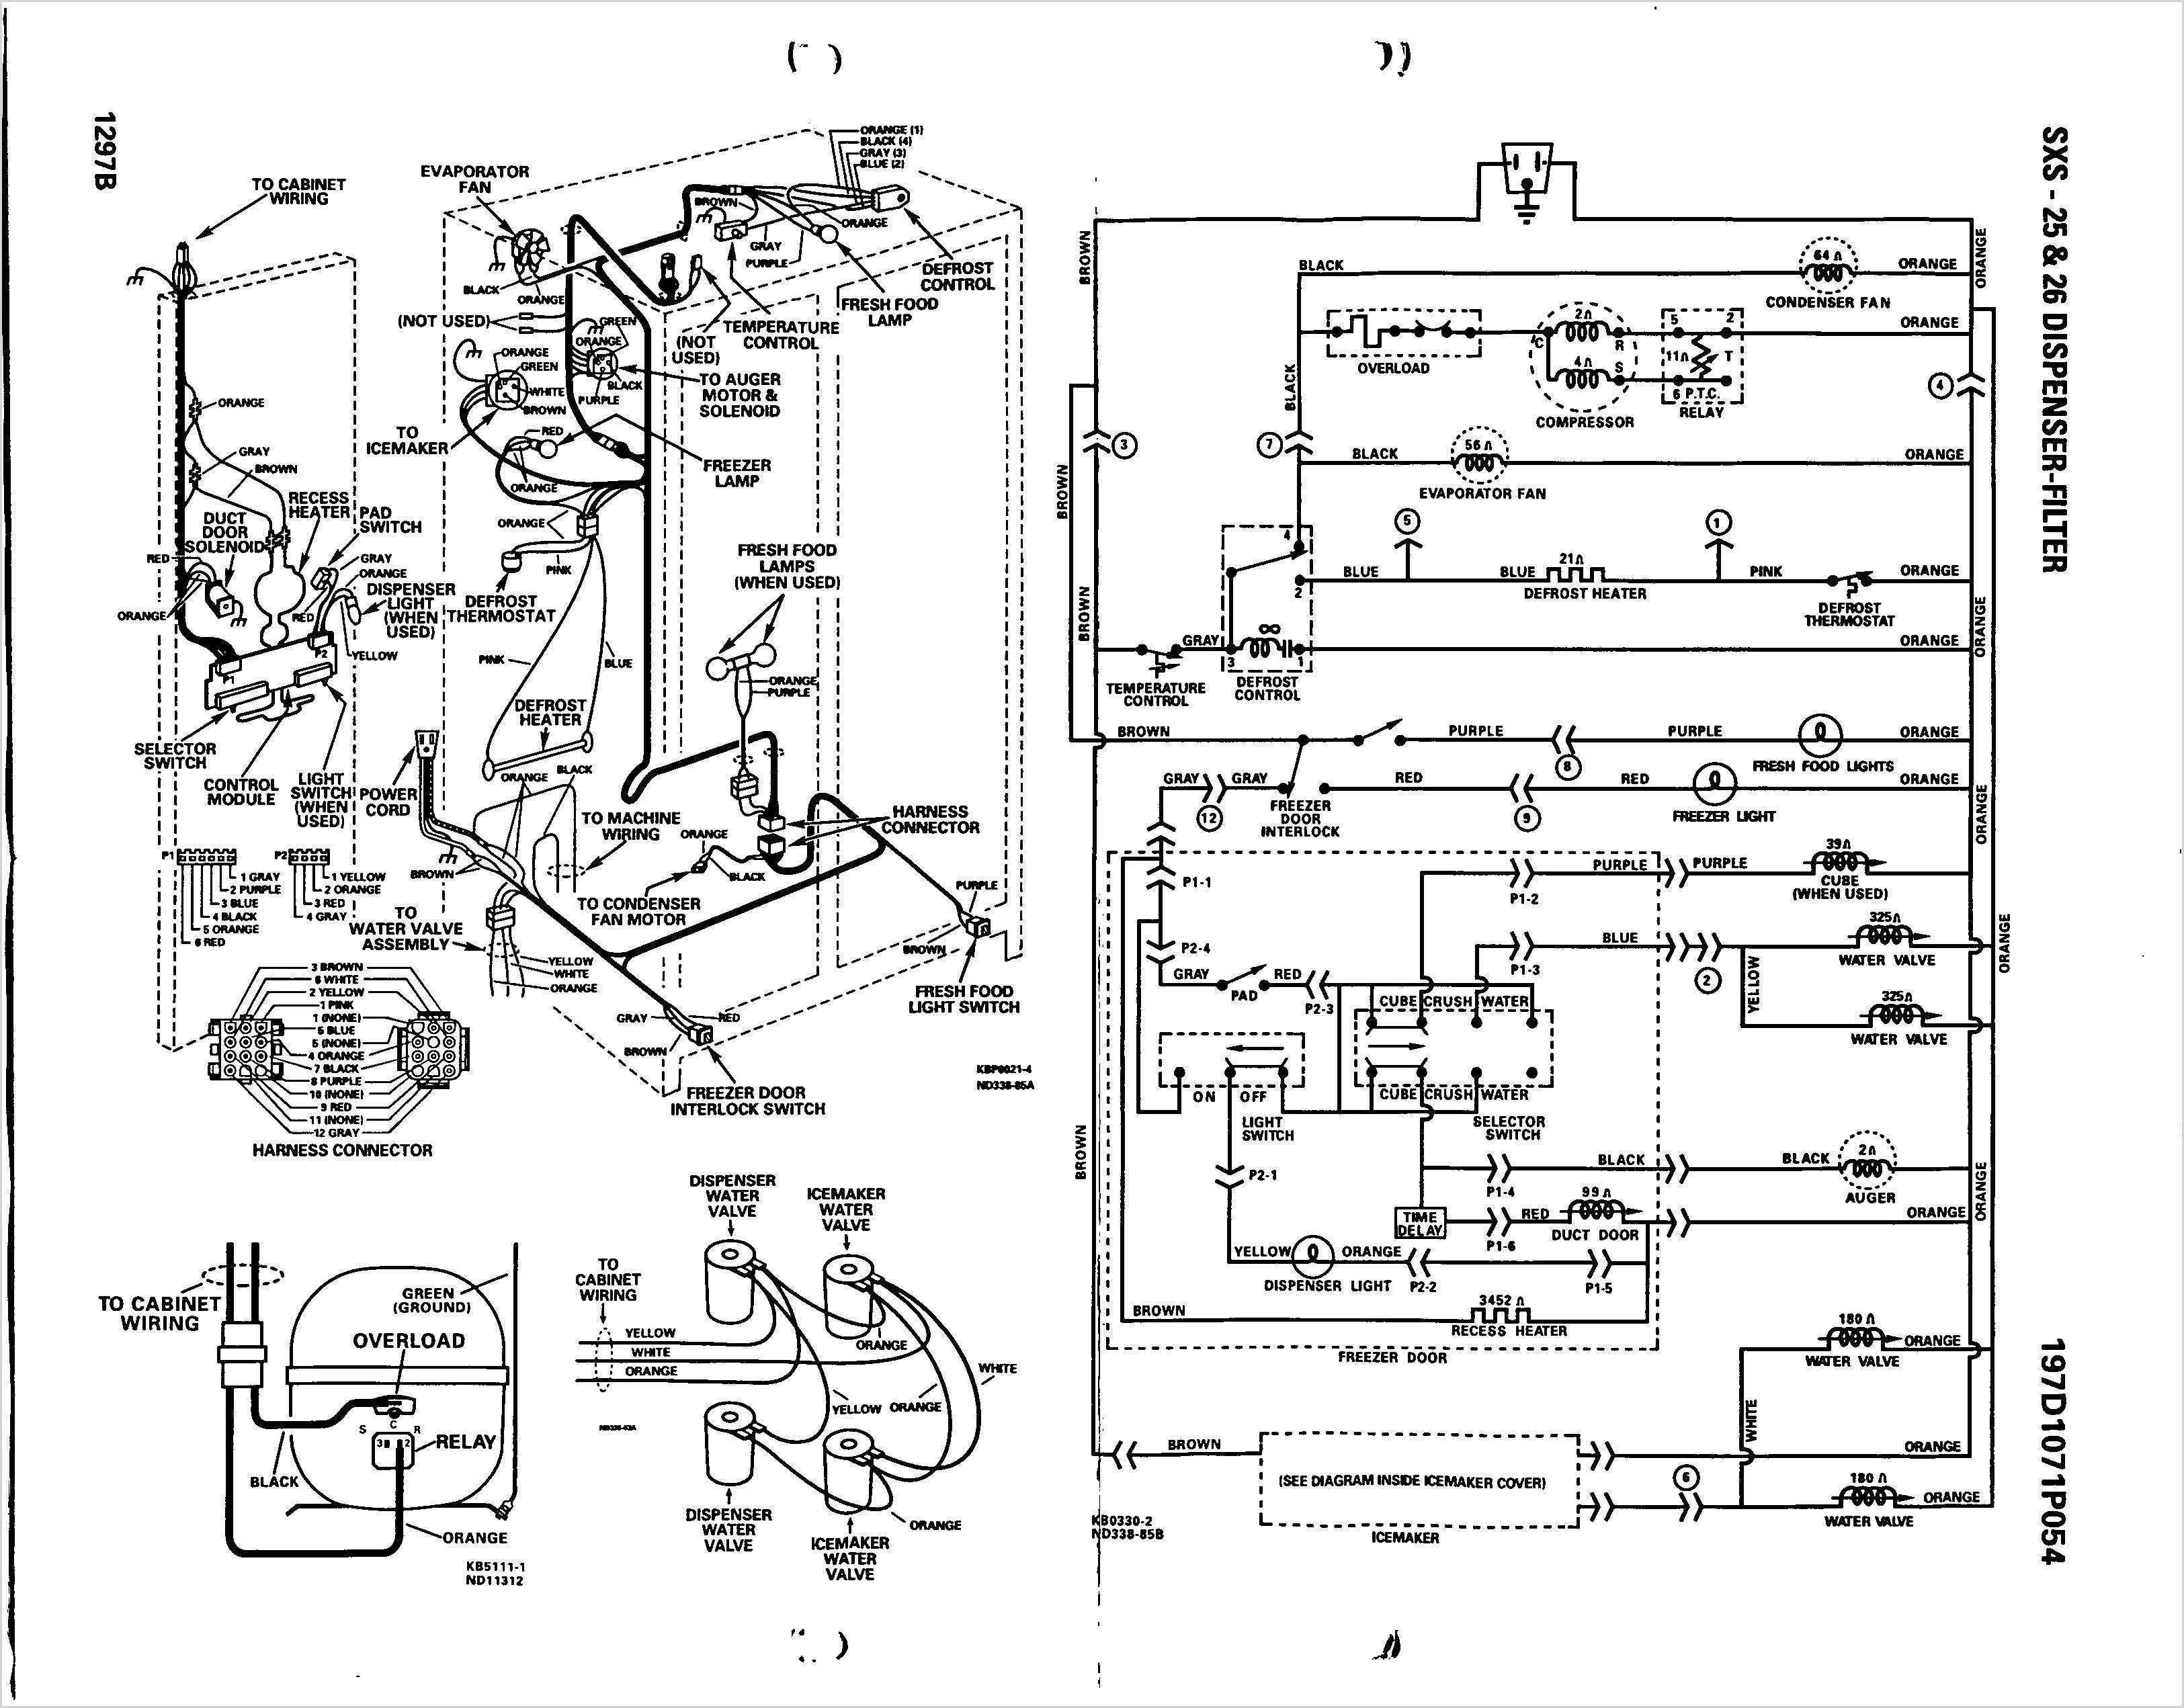 Whirlpool Dryer Wiring Diagram Luxury Fitfathers Me In Blurts Wiring Diagram for Whirlpool Gas Dryer